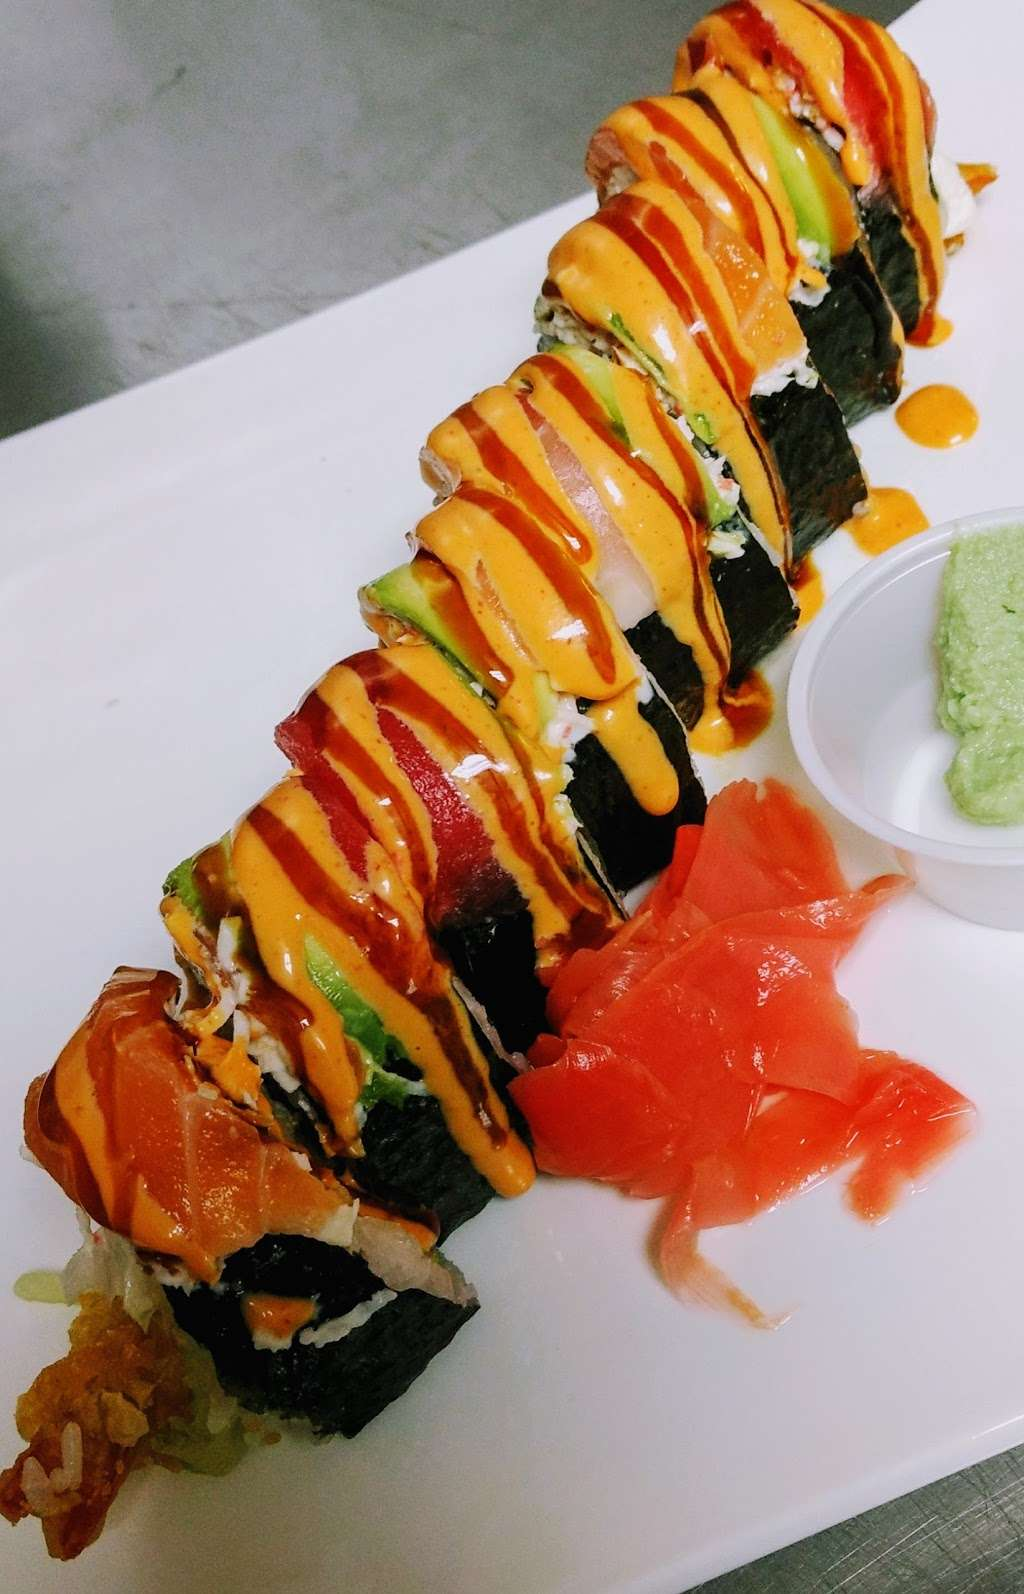 Sushi Station Revolving Sushi Bar 2223 Louisiana St Lawrence Ks 66046 Usa 2233 louisiana st, lawrence lawrence, douglas county, kansas, amerikas savienotās valstis sushi station revolving sushi bar darba laiks sushi. sushi station revolving sushi bar 2223